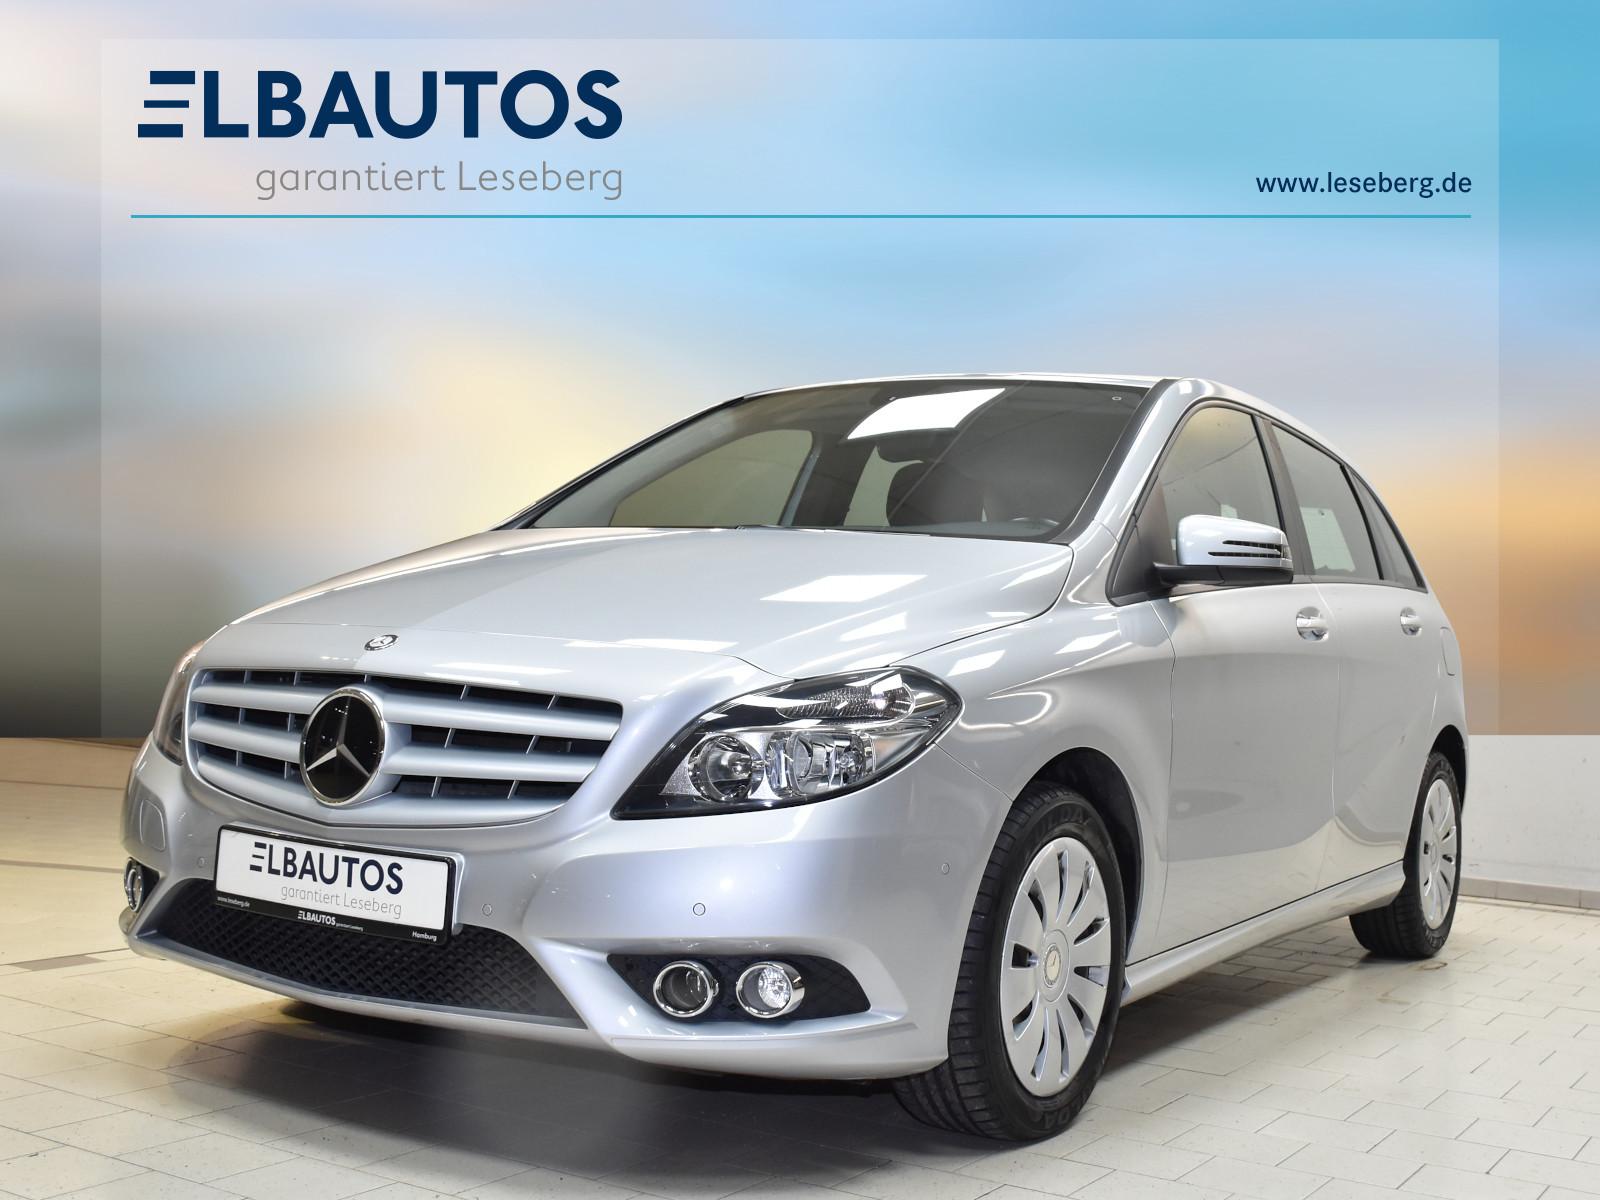 Mercedes-Benz B 220 CDI BE Rückfahrkamera/Navi/7G/Sitzheizung, Jahr 2014, Diesel